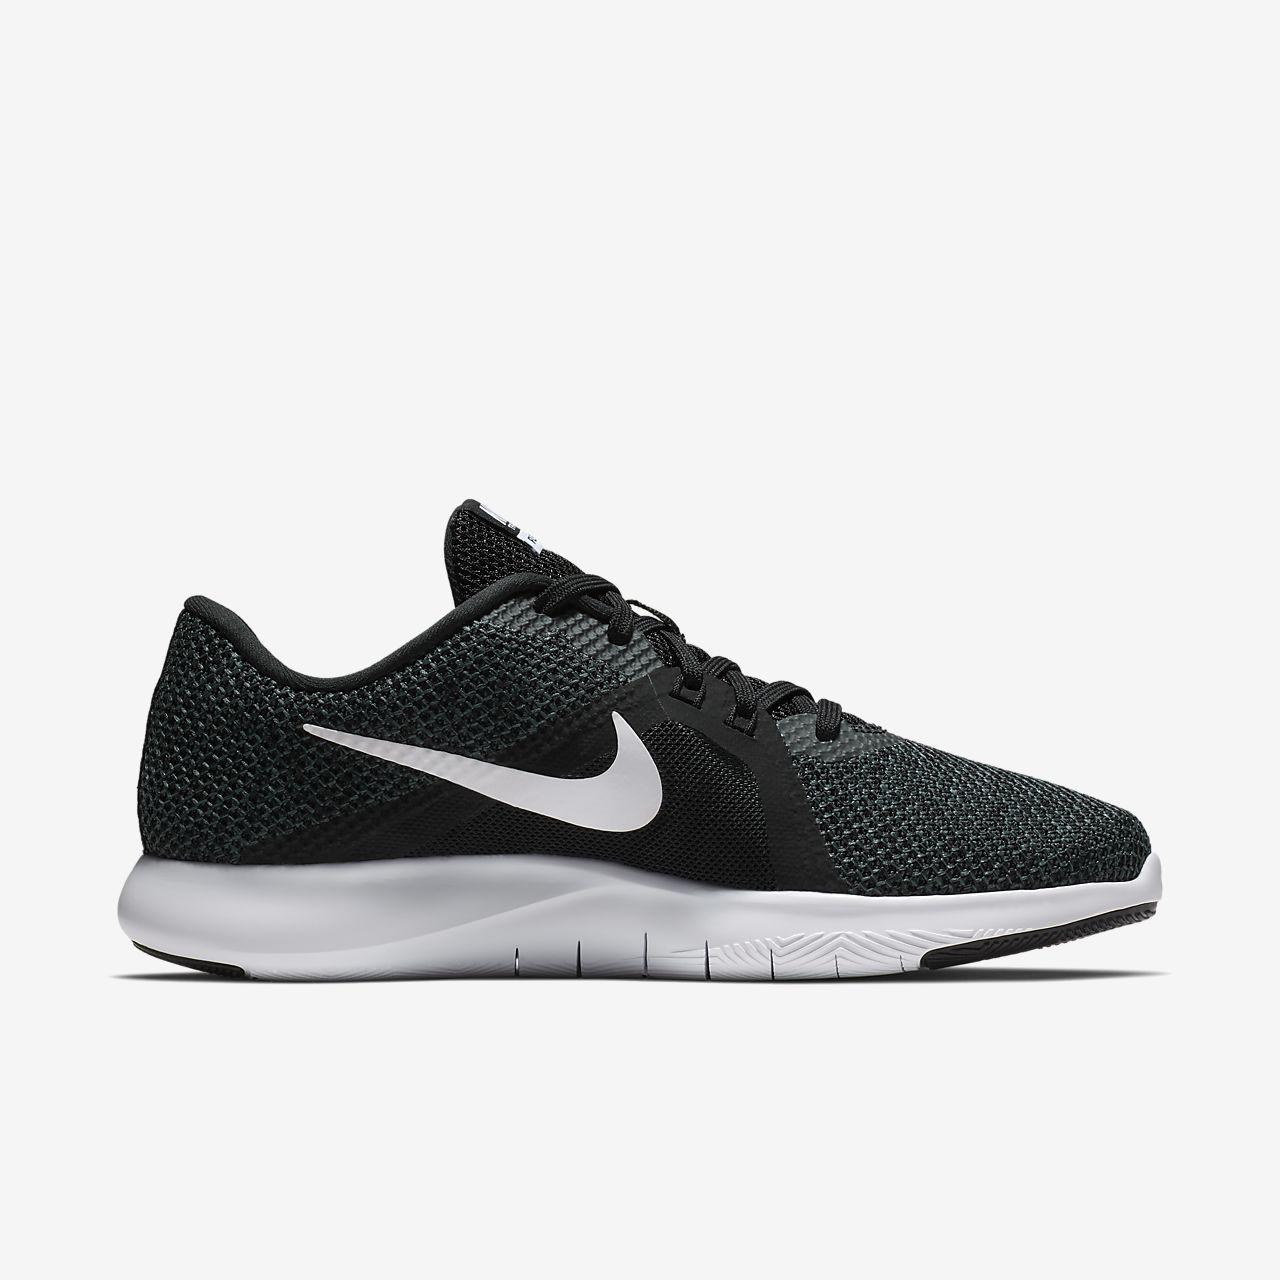 Tênis Nike Flex Trainer 8 Feminino   Nike   Nike flex, Nike